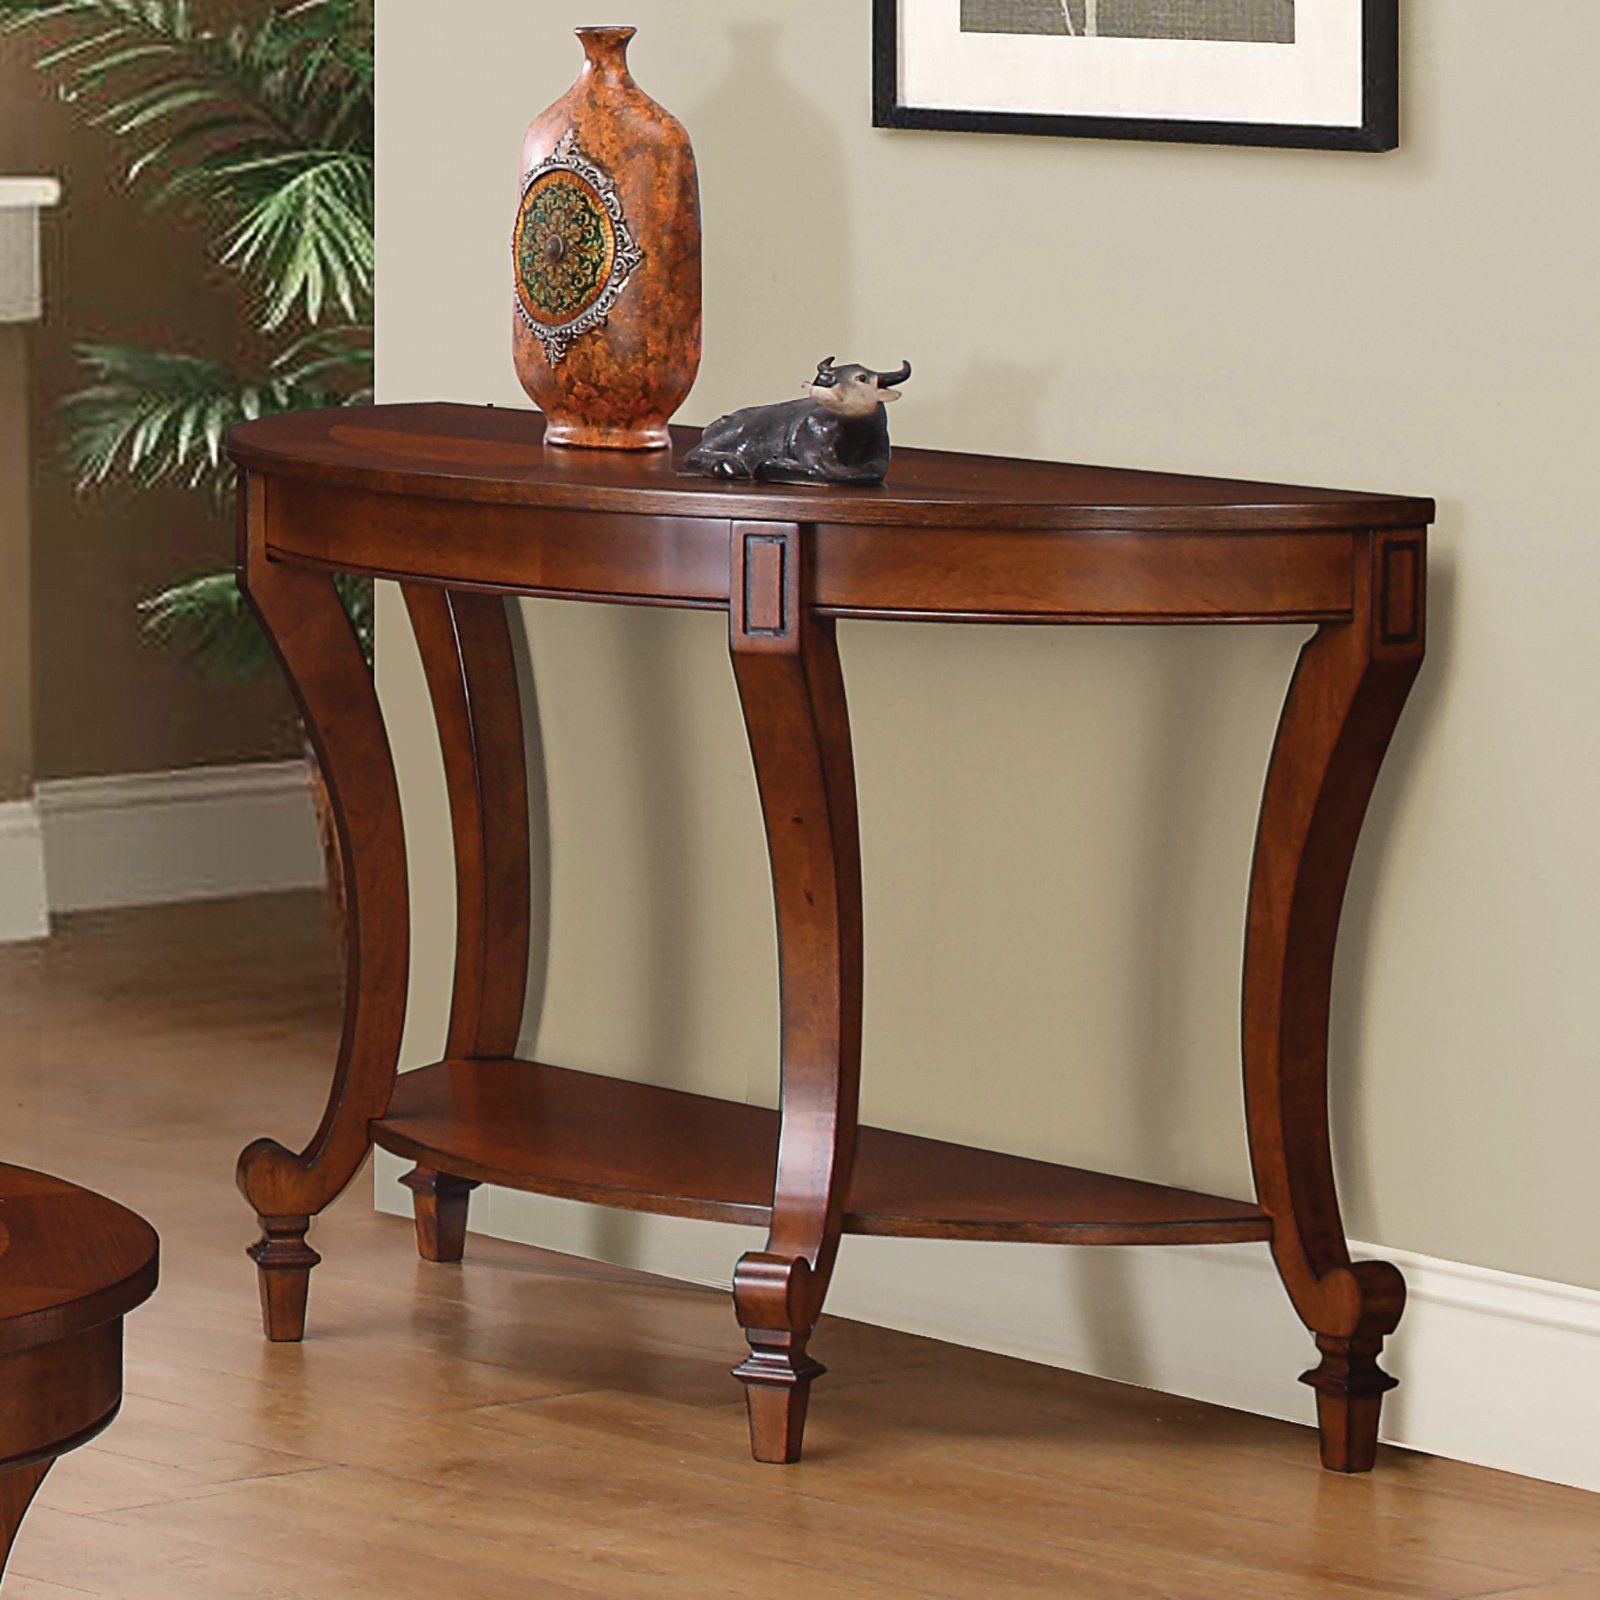 Coaster Furniture Crescent Sofa Table Warm Brown Furniture